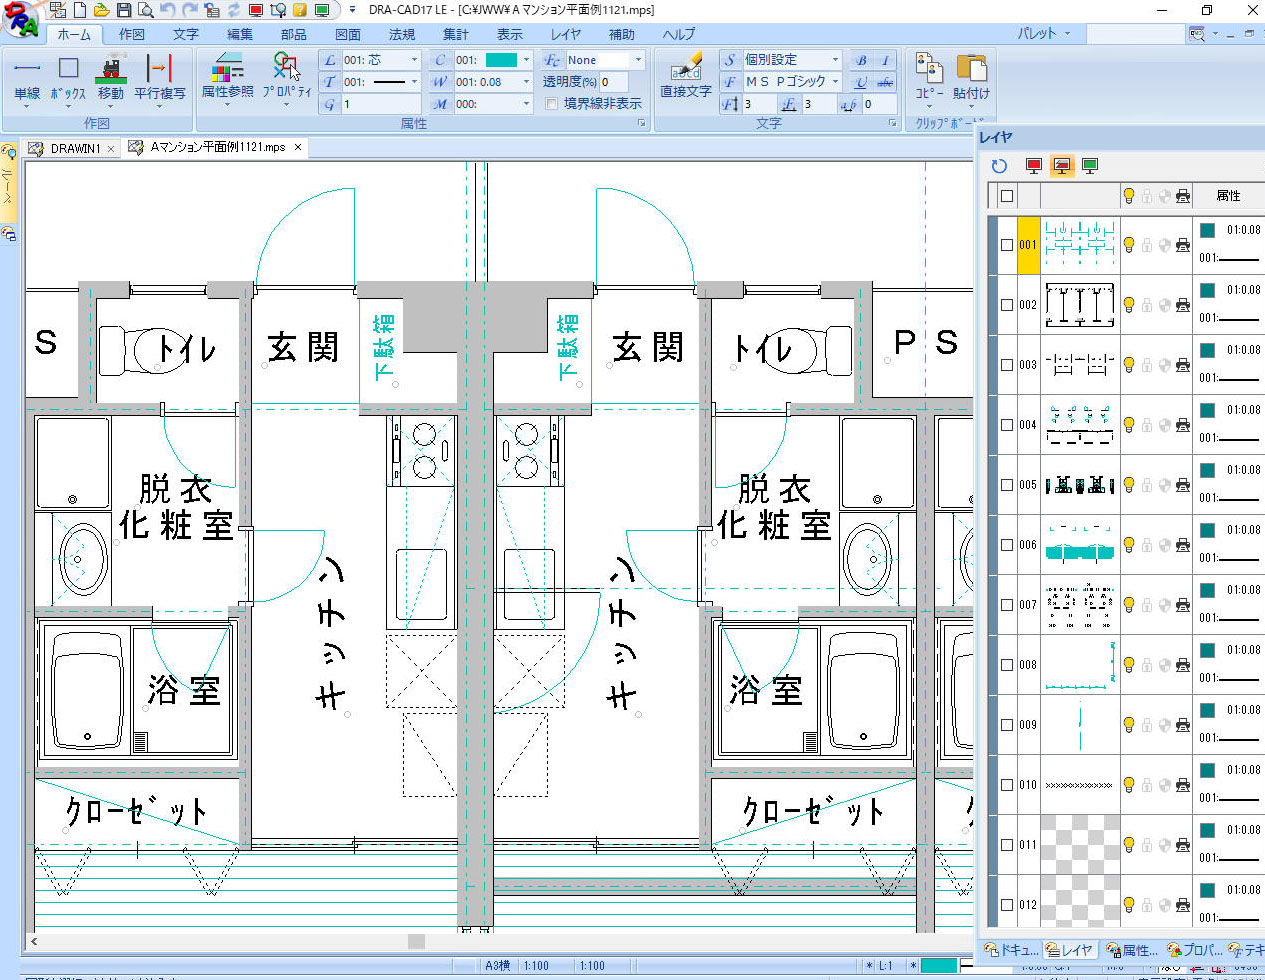 DRA-CAD18 LE バージョンアップ キャンペーン(DRA CAD15以前から)送料無料(2020年3月31日まで)